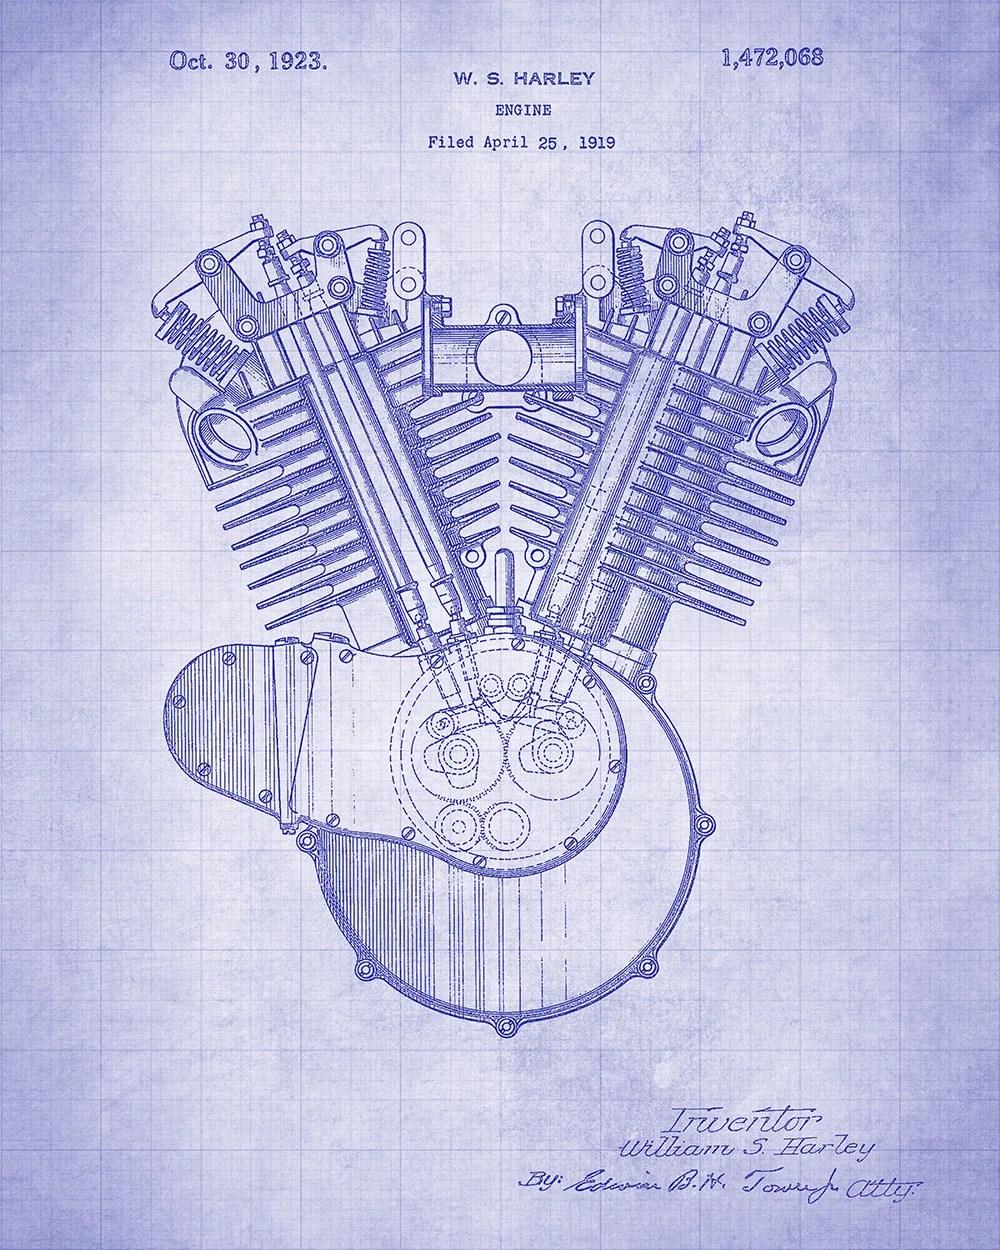 medium resolution of harley internal combustion engine patent art print harley davidson motorcycle engine patent art print harley davidson patent print